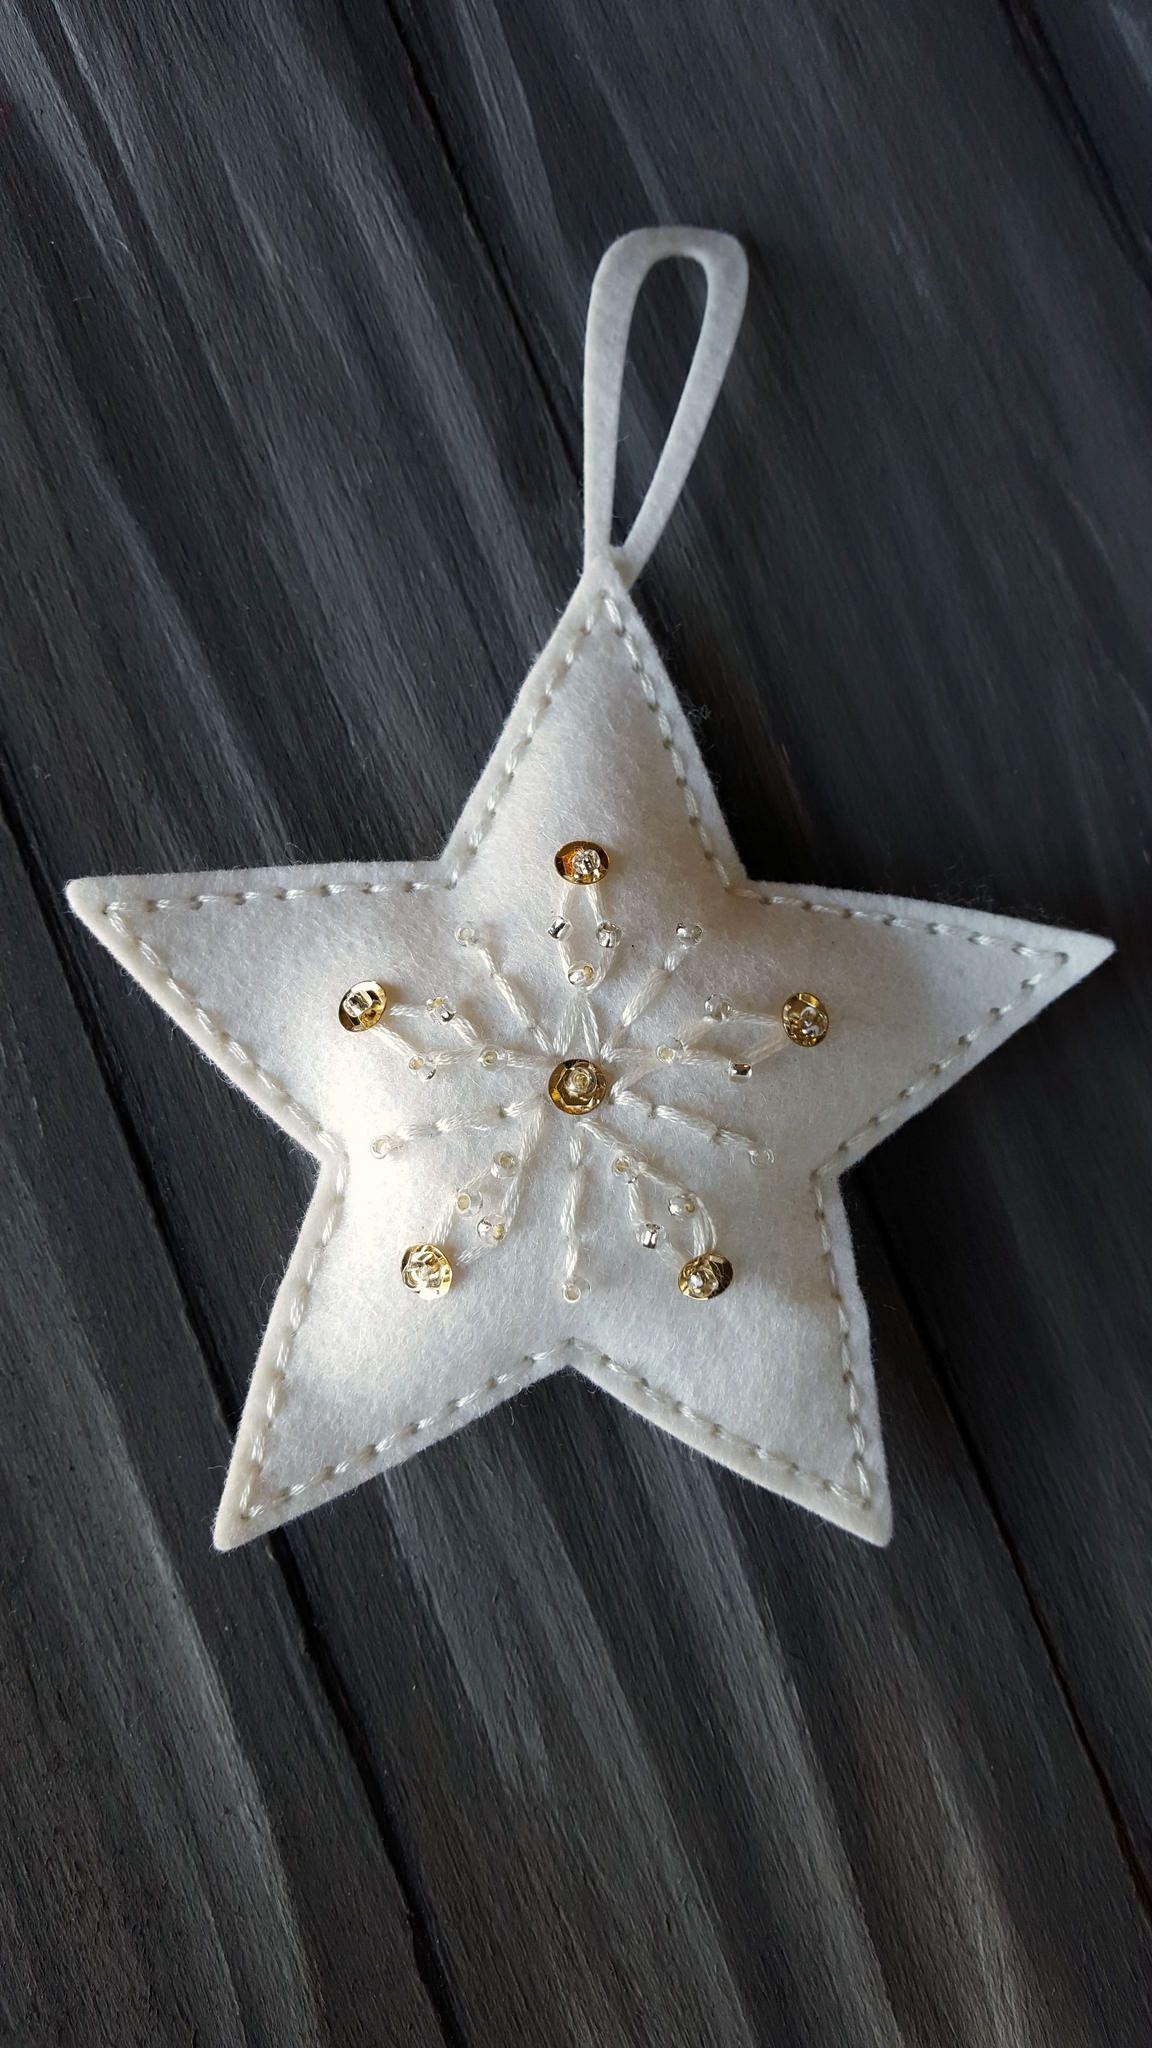 079 Felt Christmas Star Pendant Felt Christmas Star Ornament Bachelorettegifts Giftsfo In 2020 With Images Felt Christmas Ornaments Easy Christmas Ornaments Felt Christmas